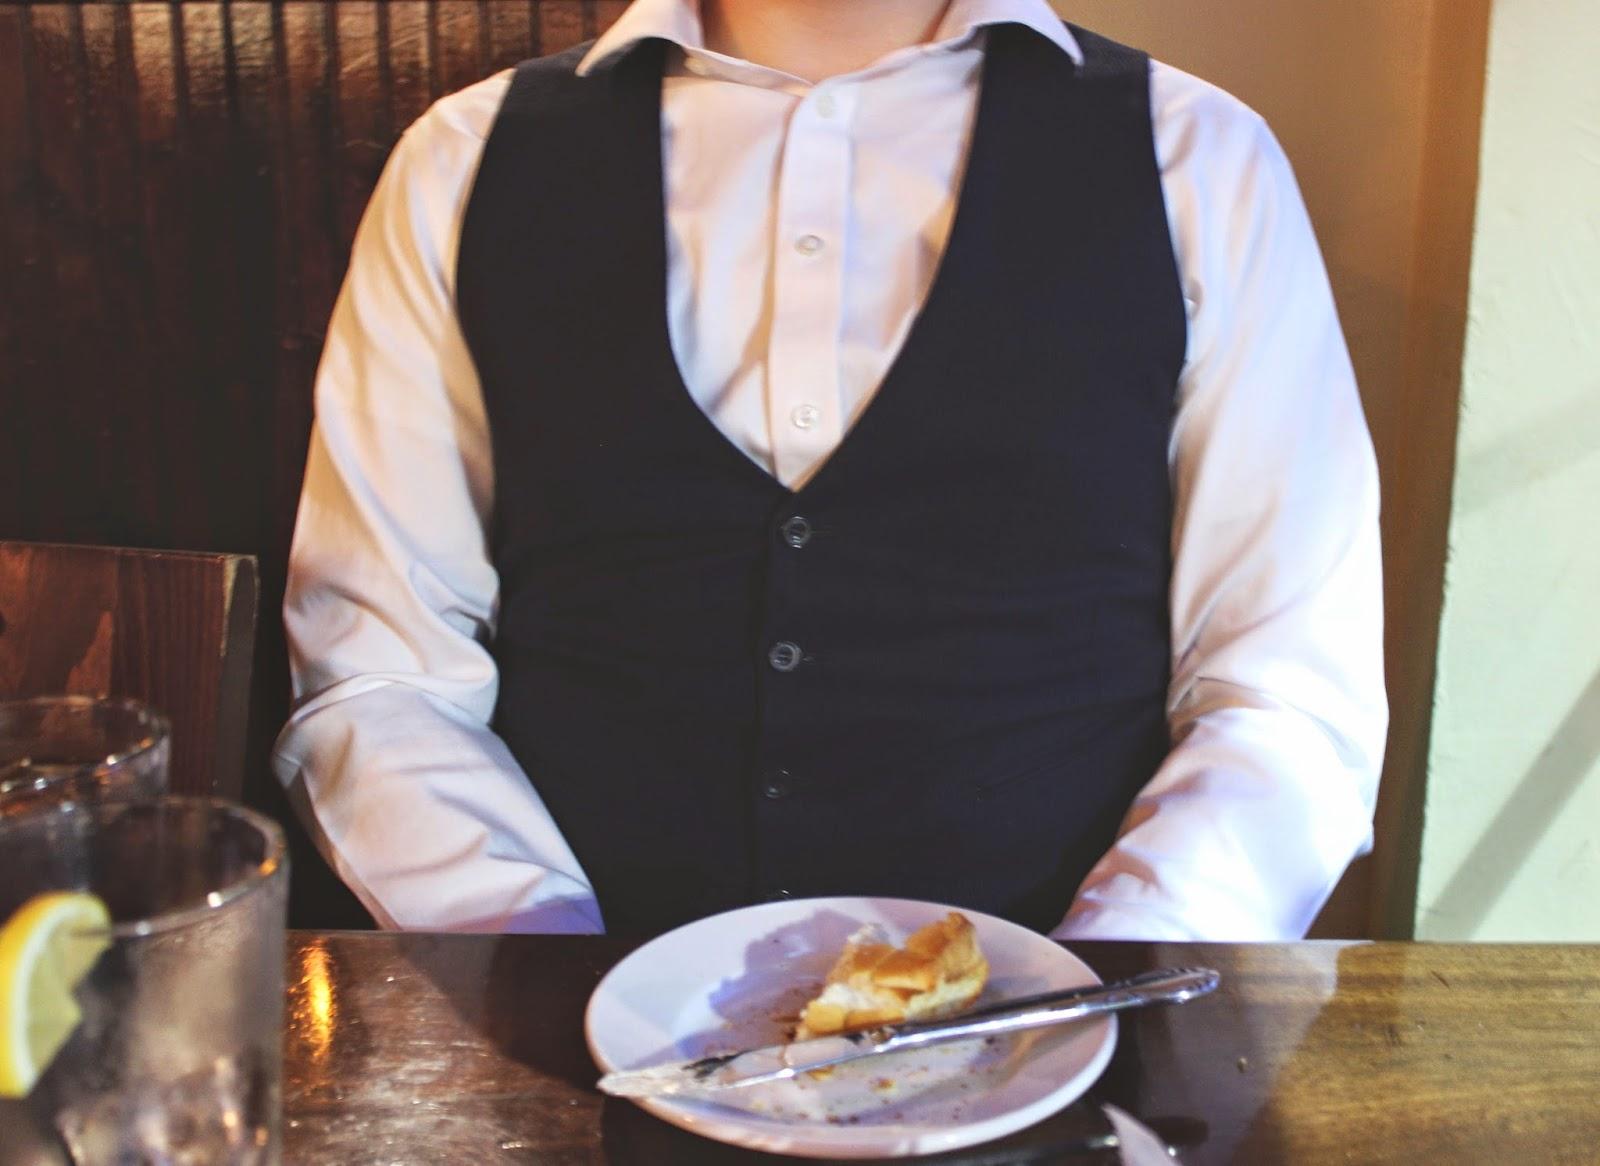 Downton Abbey s Laura Carmichael Is Dating Costar Michael Fox Pic